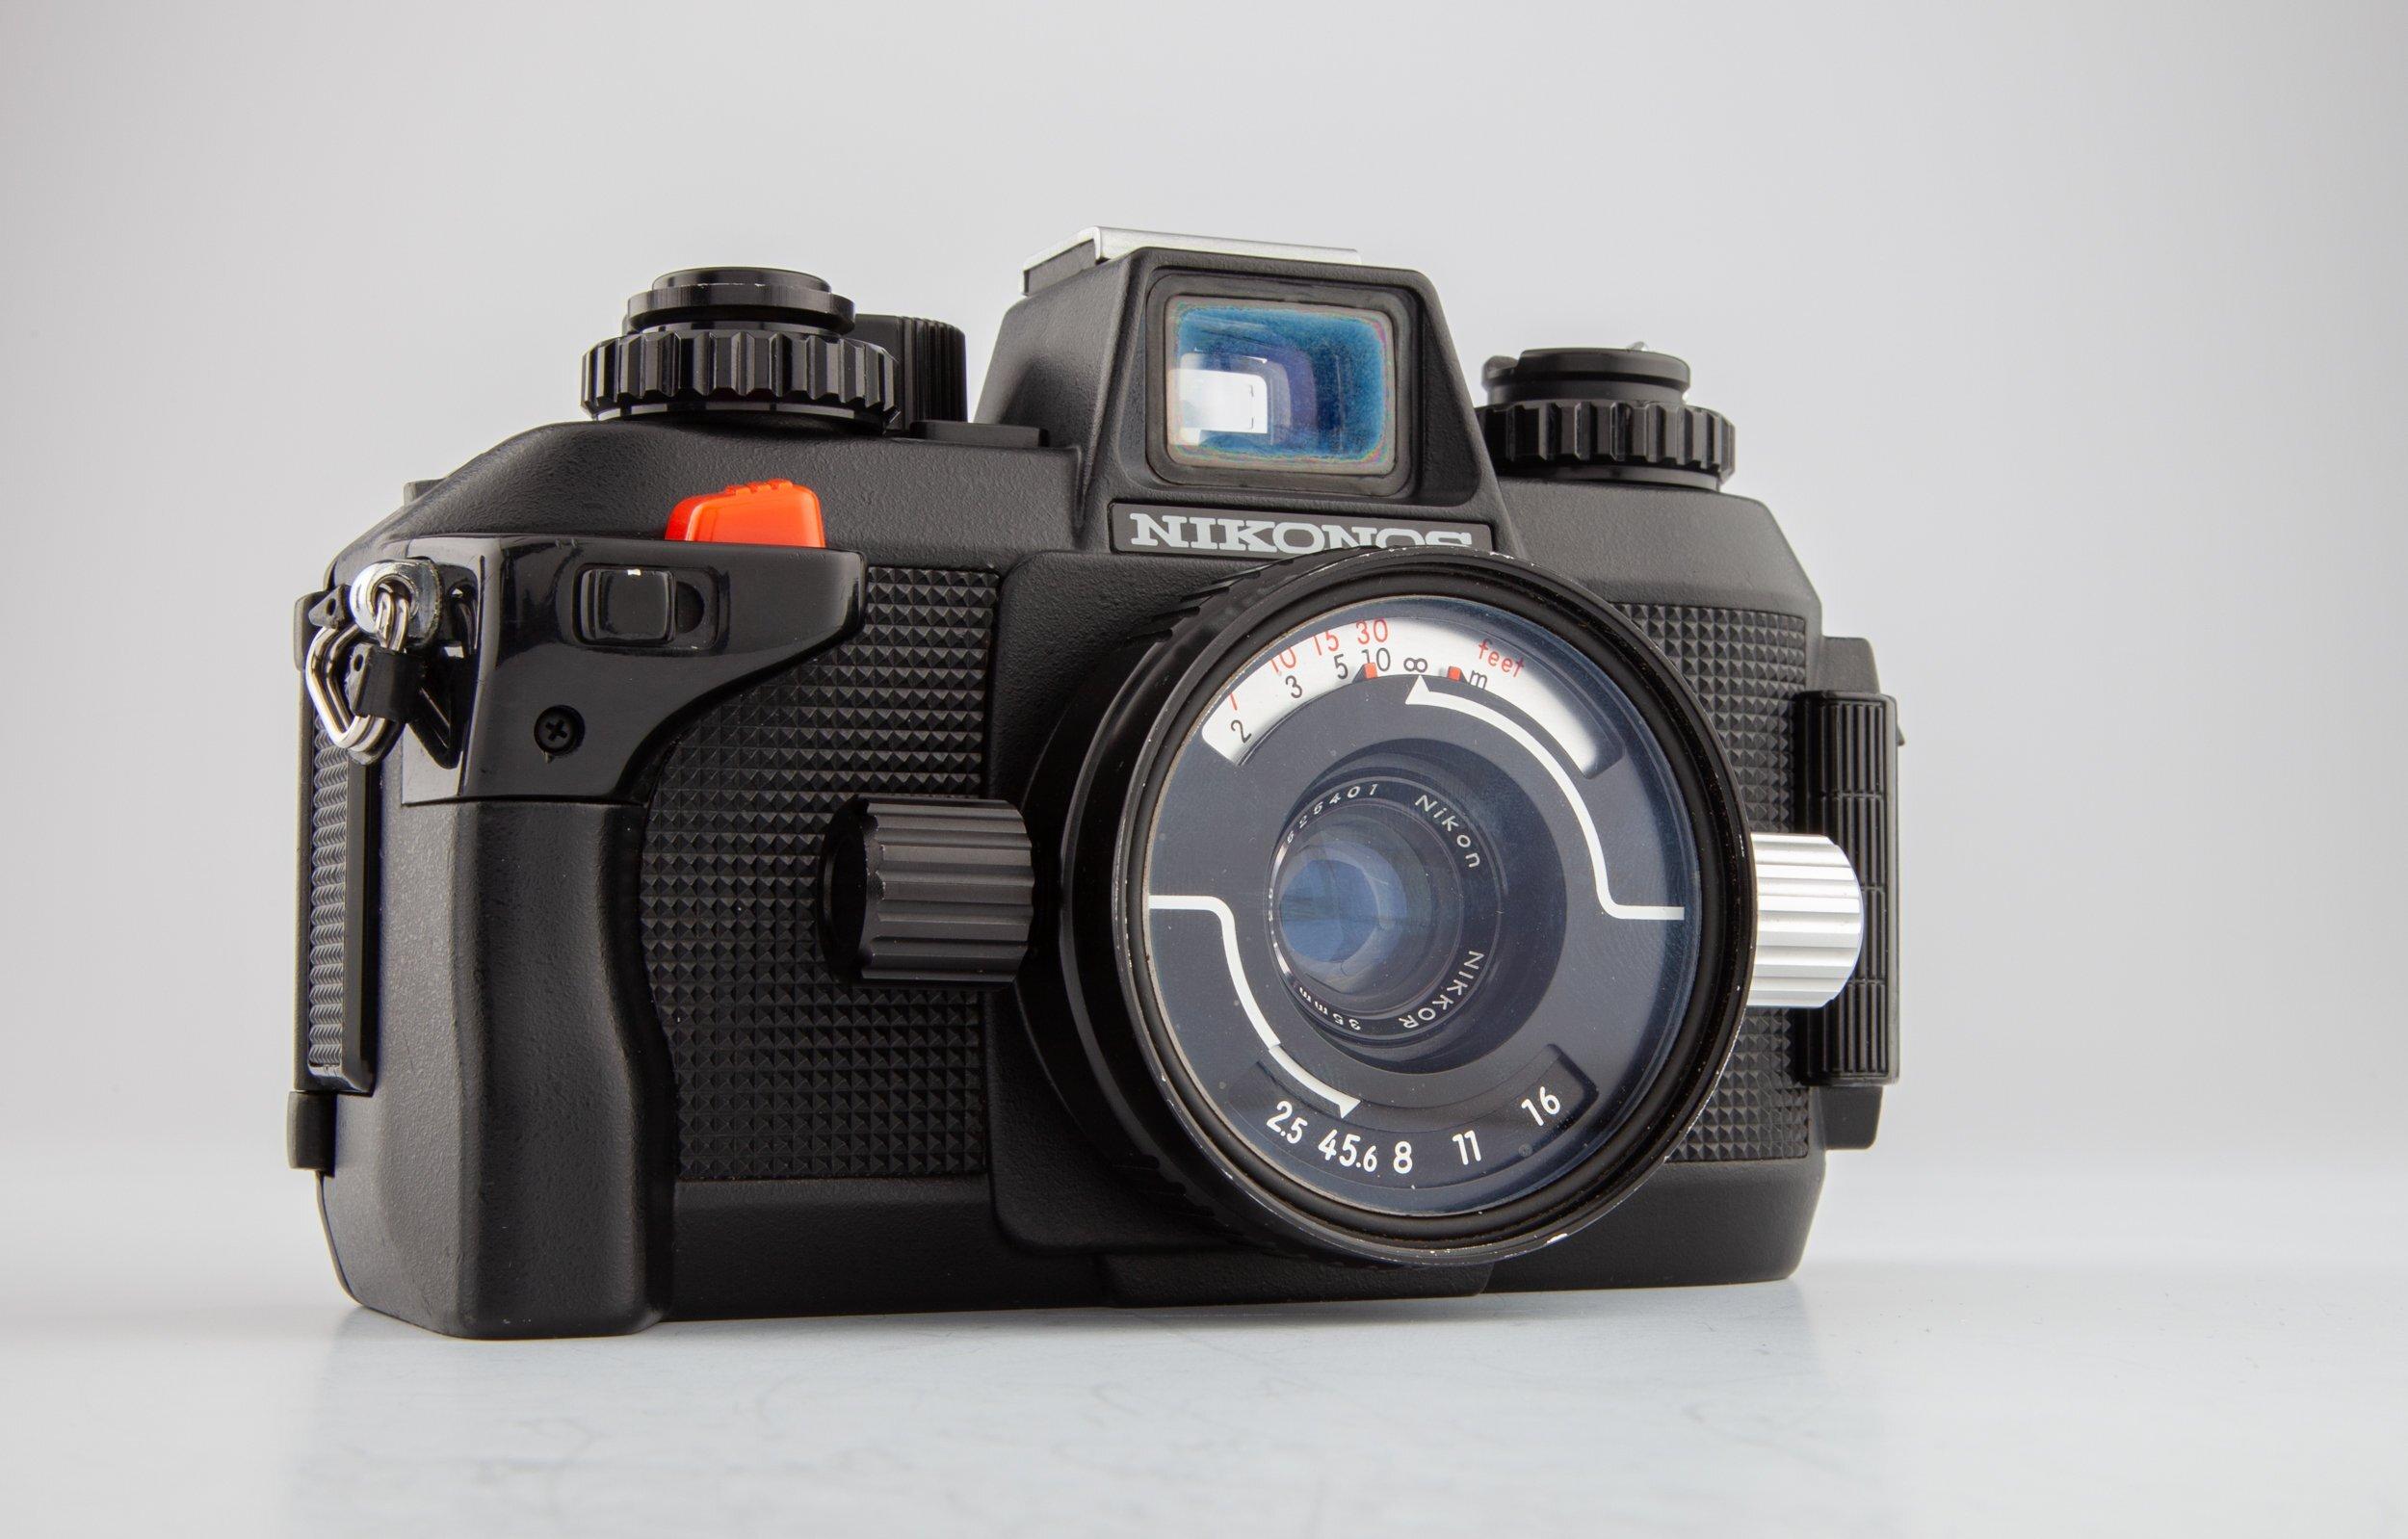 Nikonos-IV-A Gehäuse + Nikon Nikkor 2,5/35mm